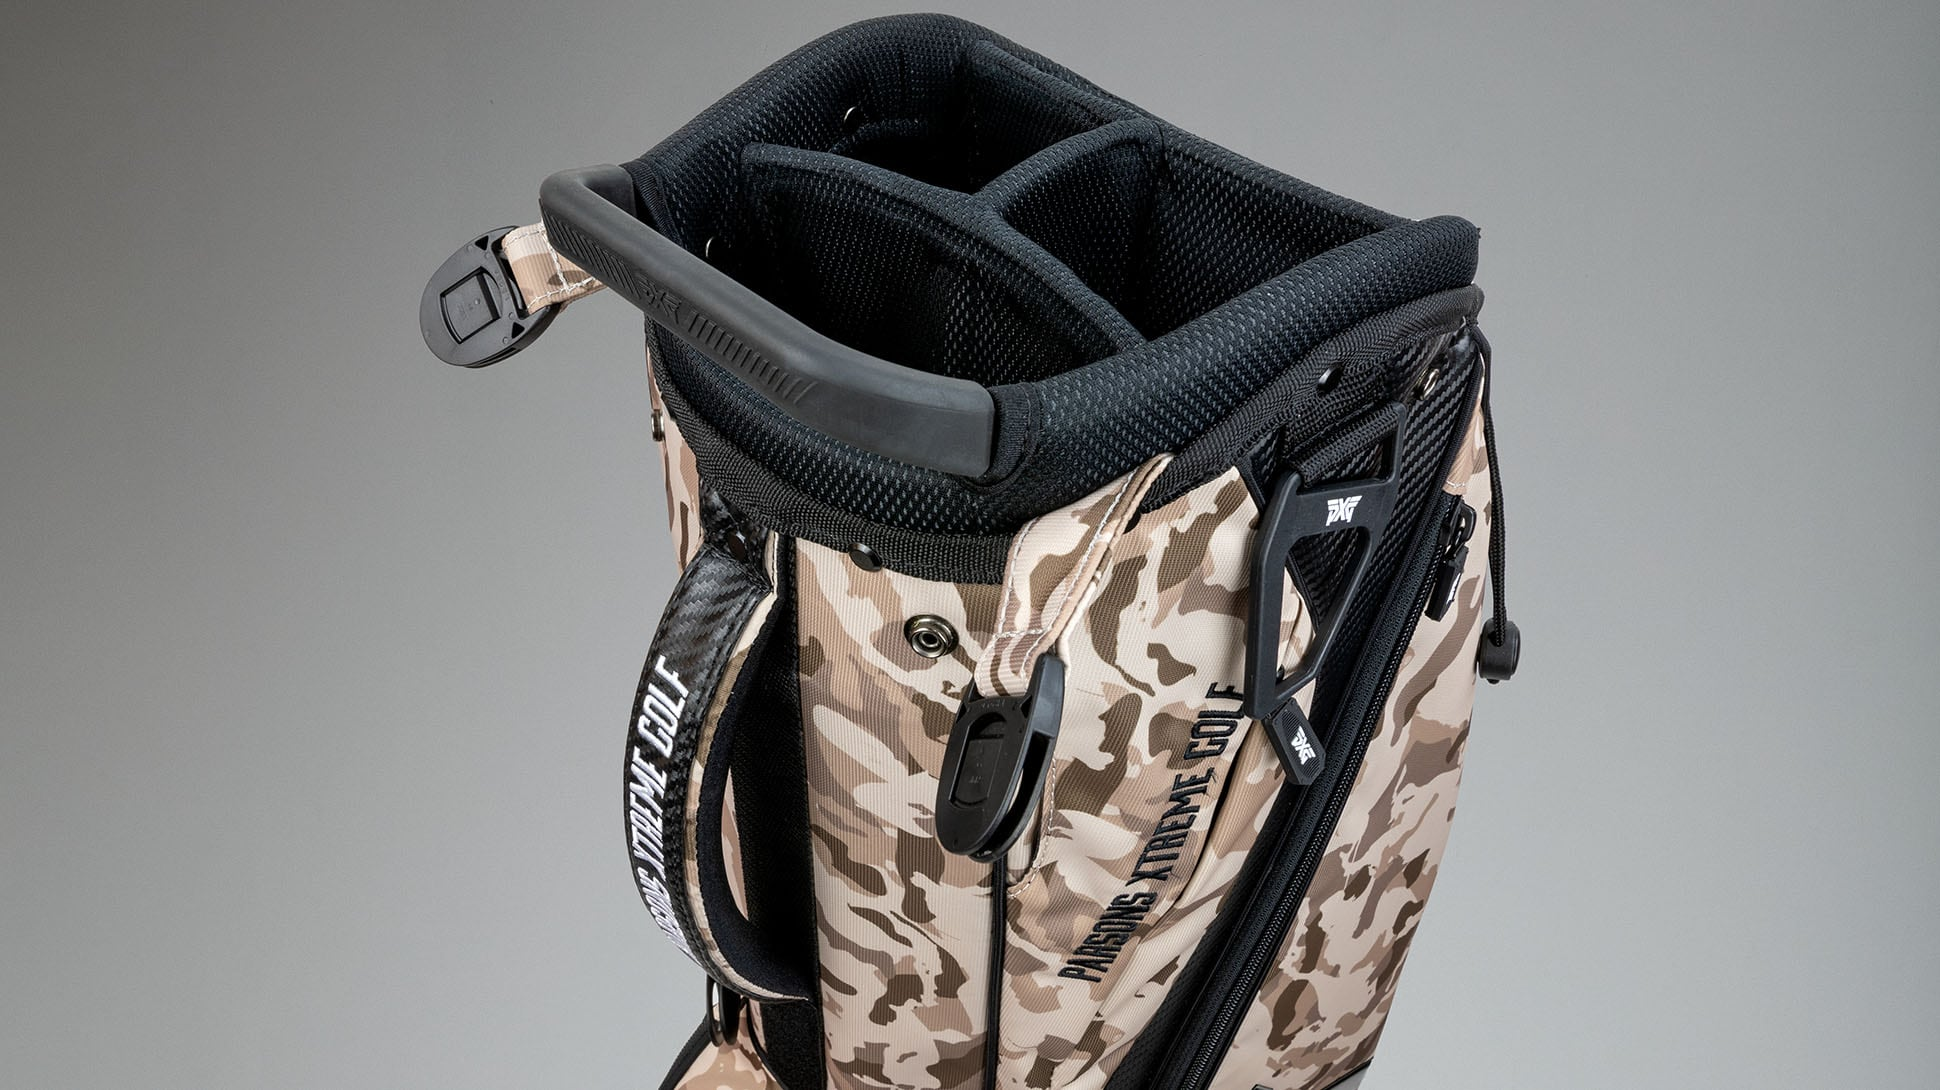 Desert Tan Fairway Camo™ Carry Stand Bag Image 4